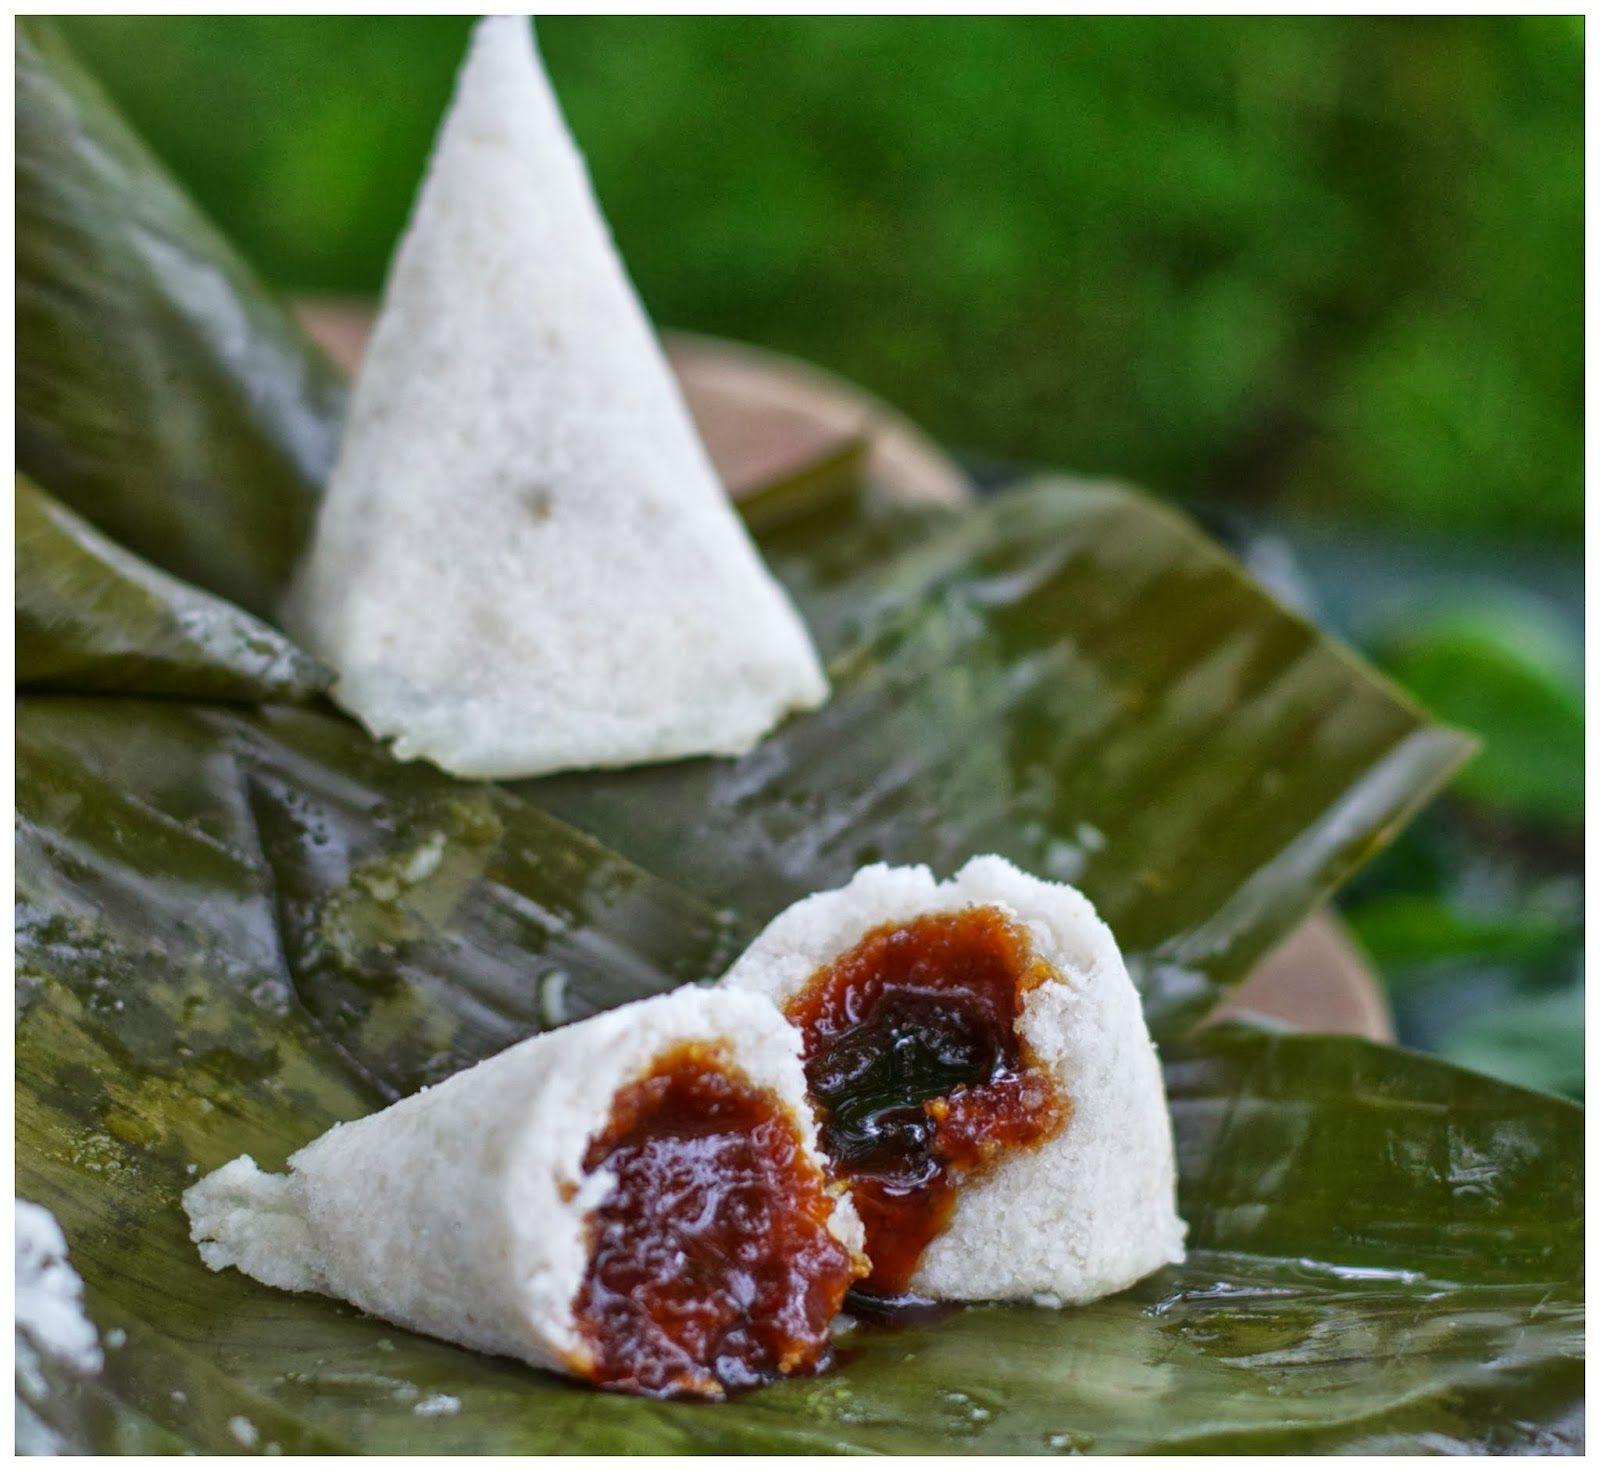 Indonesian Medan Food Ombus Ombus Pohul Pohul Itak Gurgur Resep Masakan Malaysia Ide Makanan Masakan